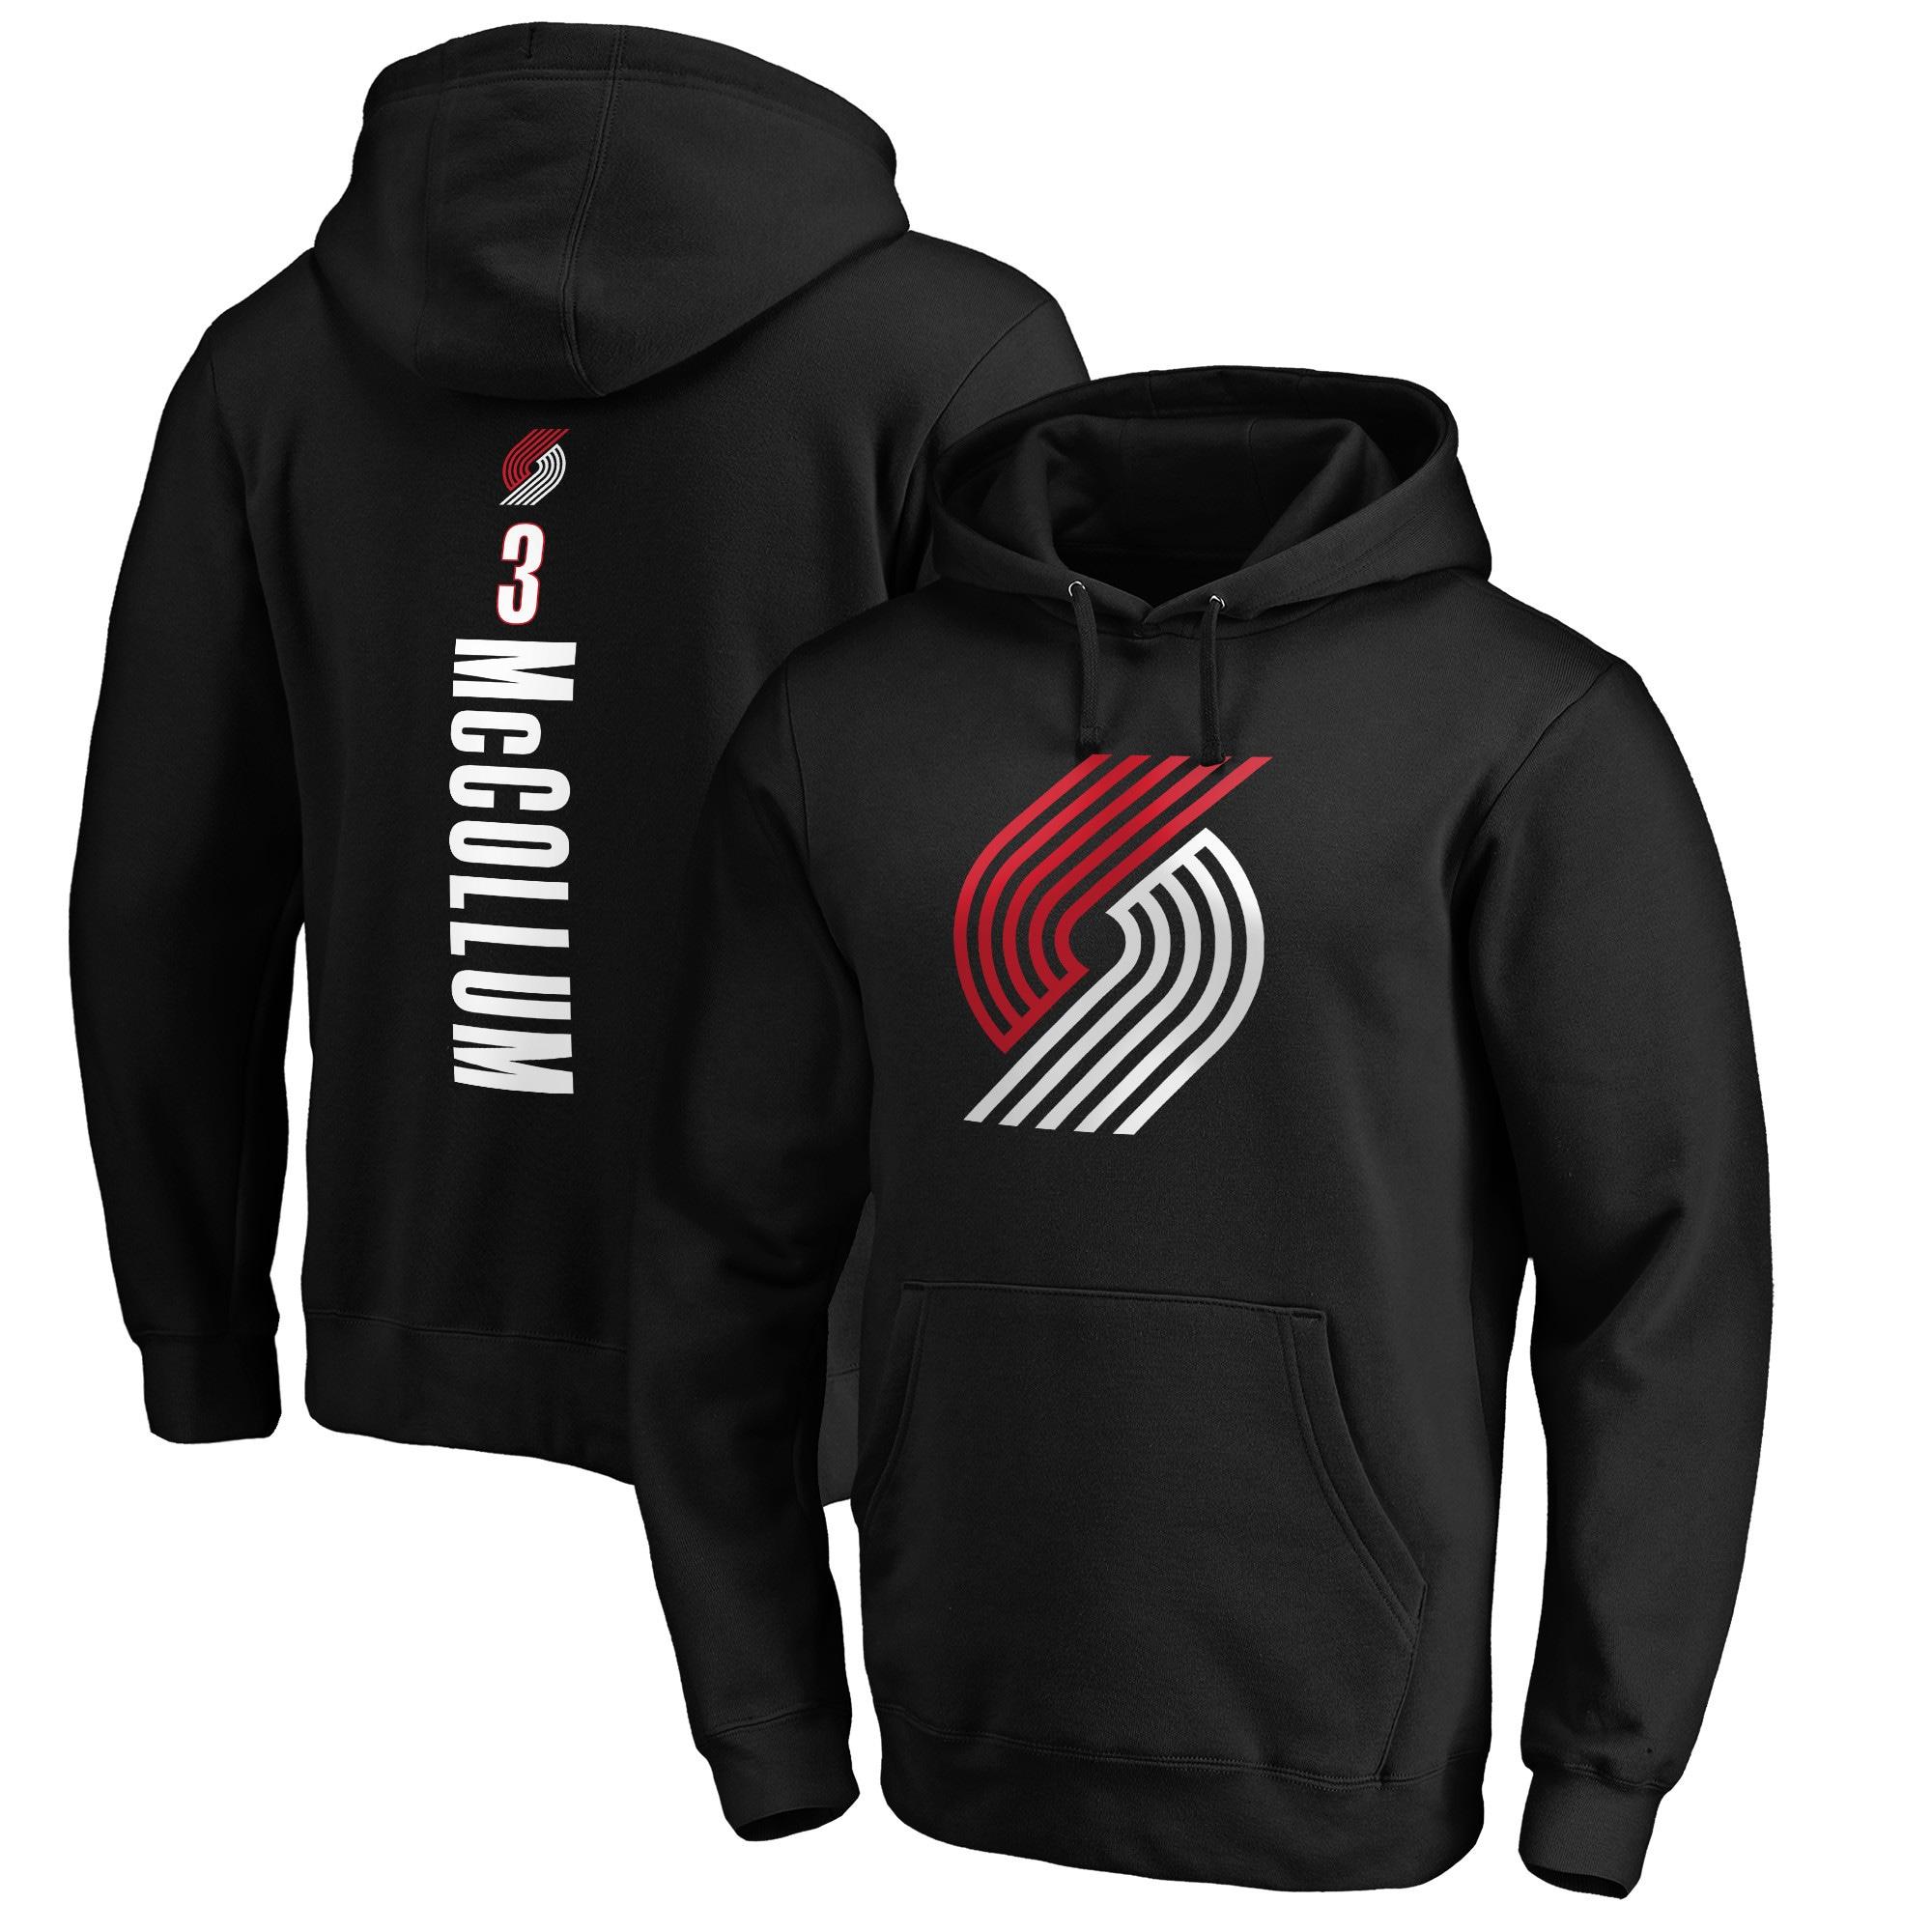 C.J. McCollum Portland Trail Blazers Fanatics Branded Team Playmaker Name & Number Pullover Hoodie - Black